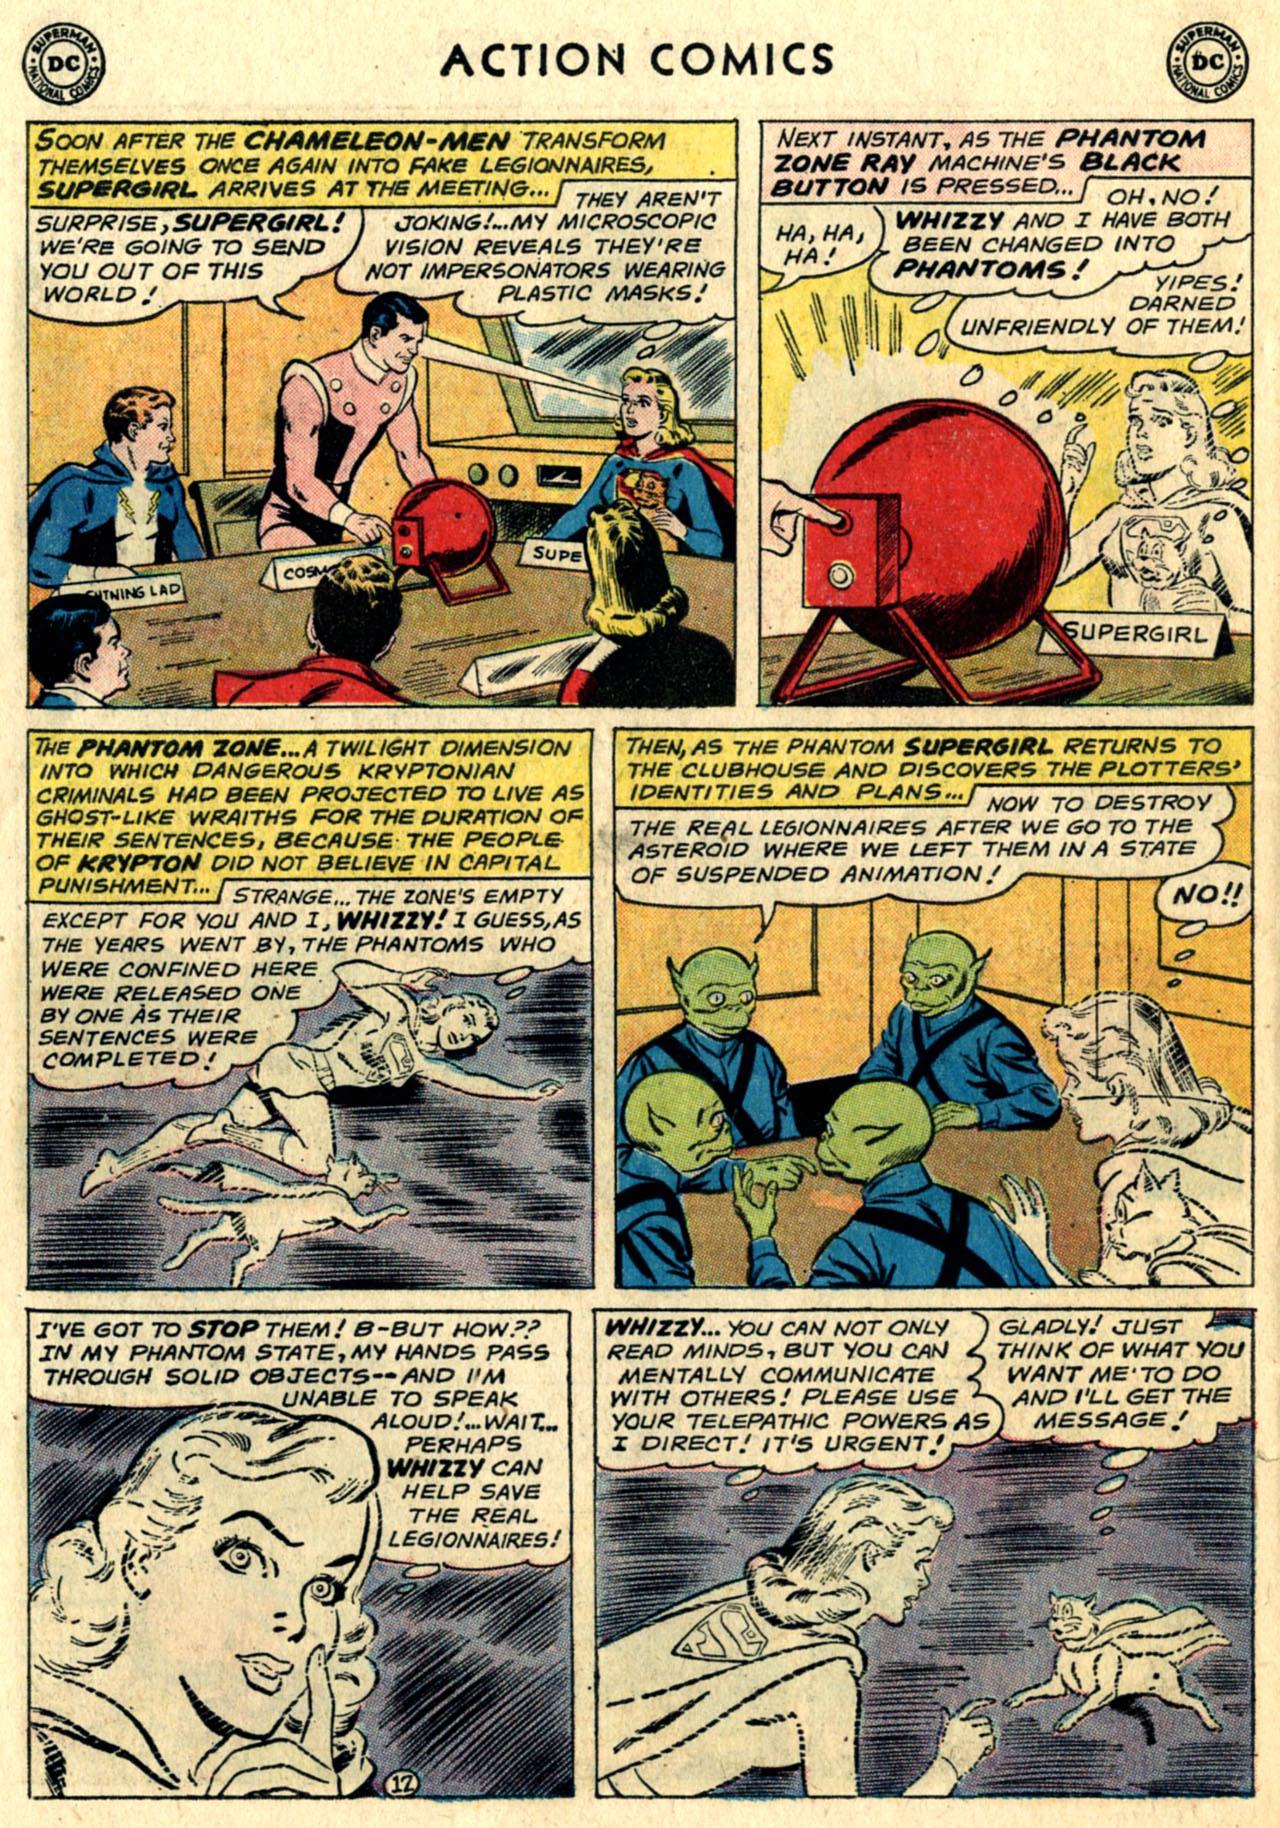 Action Comics (1938) 287 Page 29